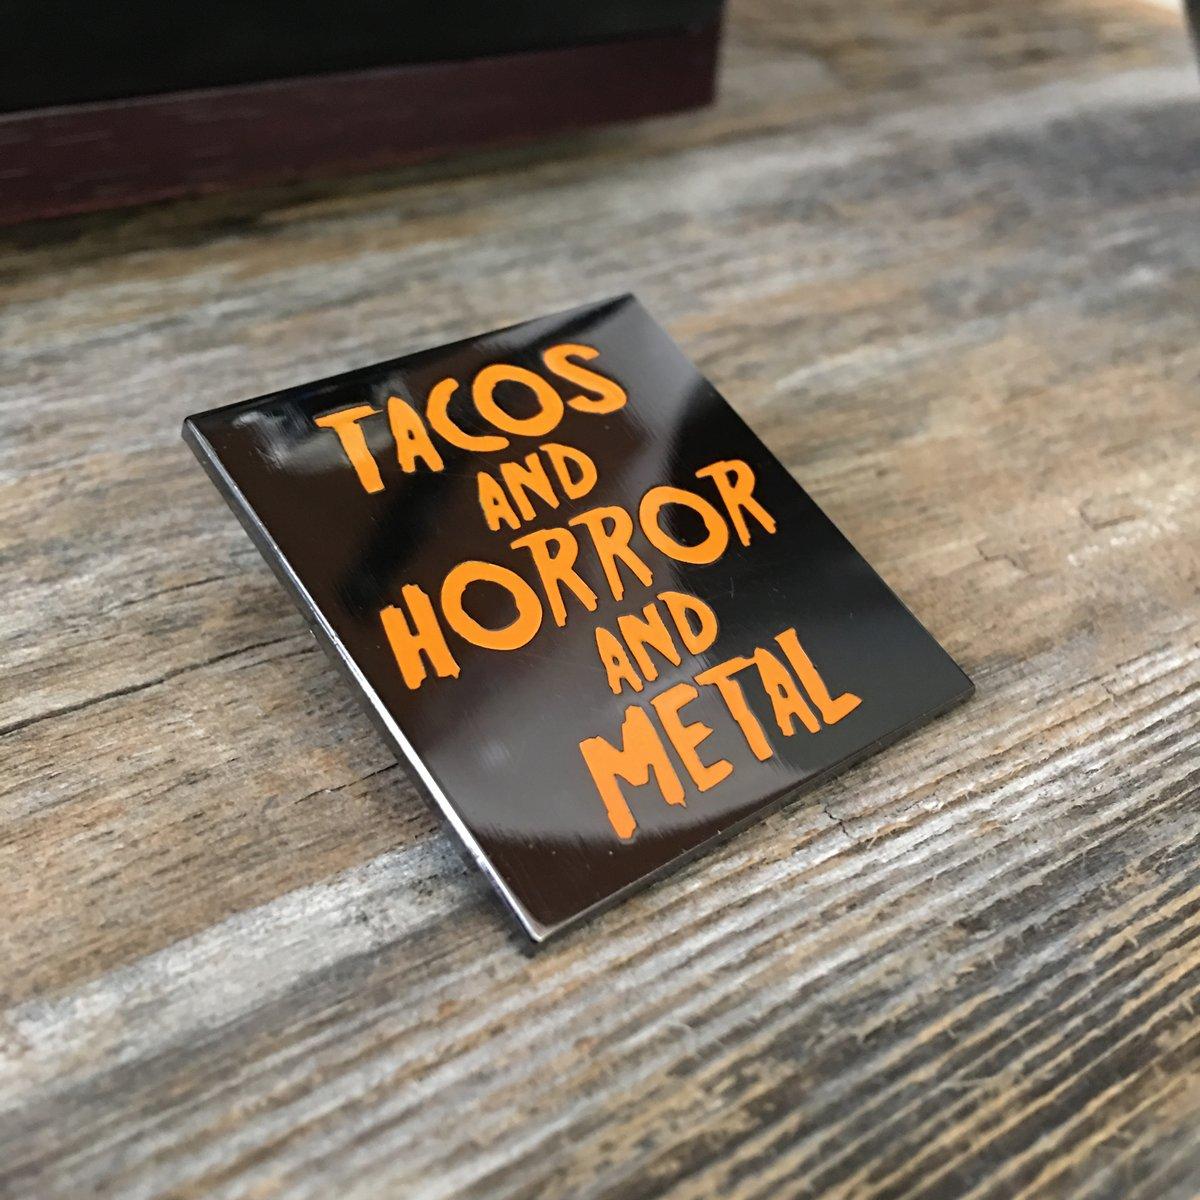 Image of Tacos & Horror & Metal Lapel Pin